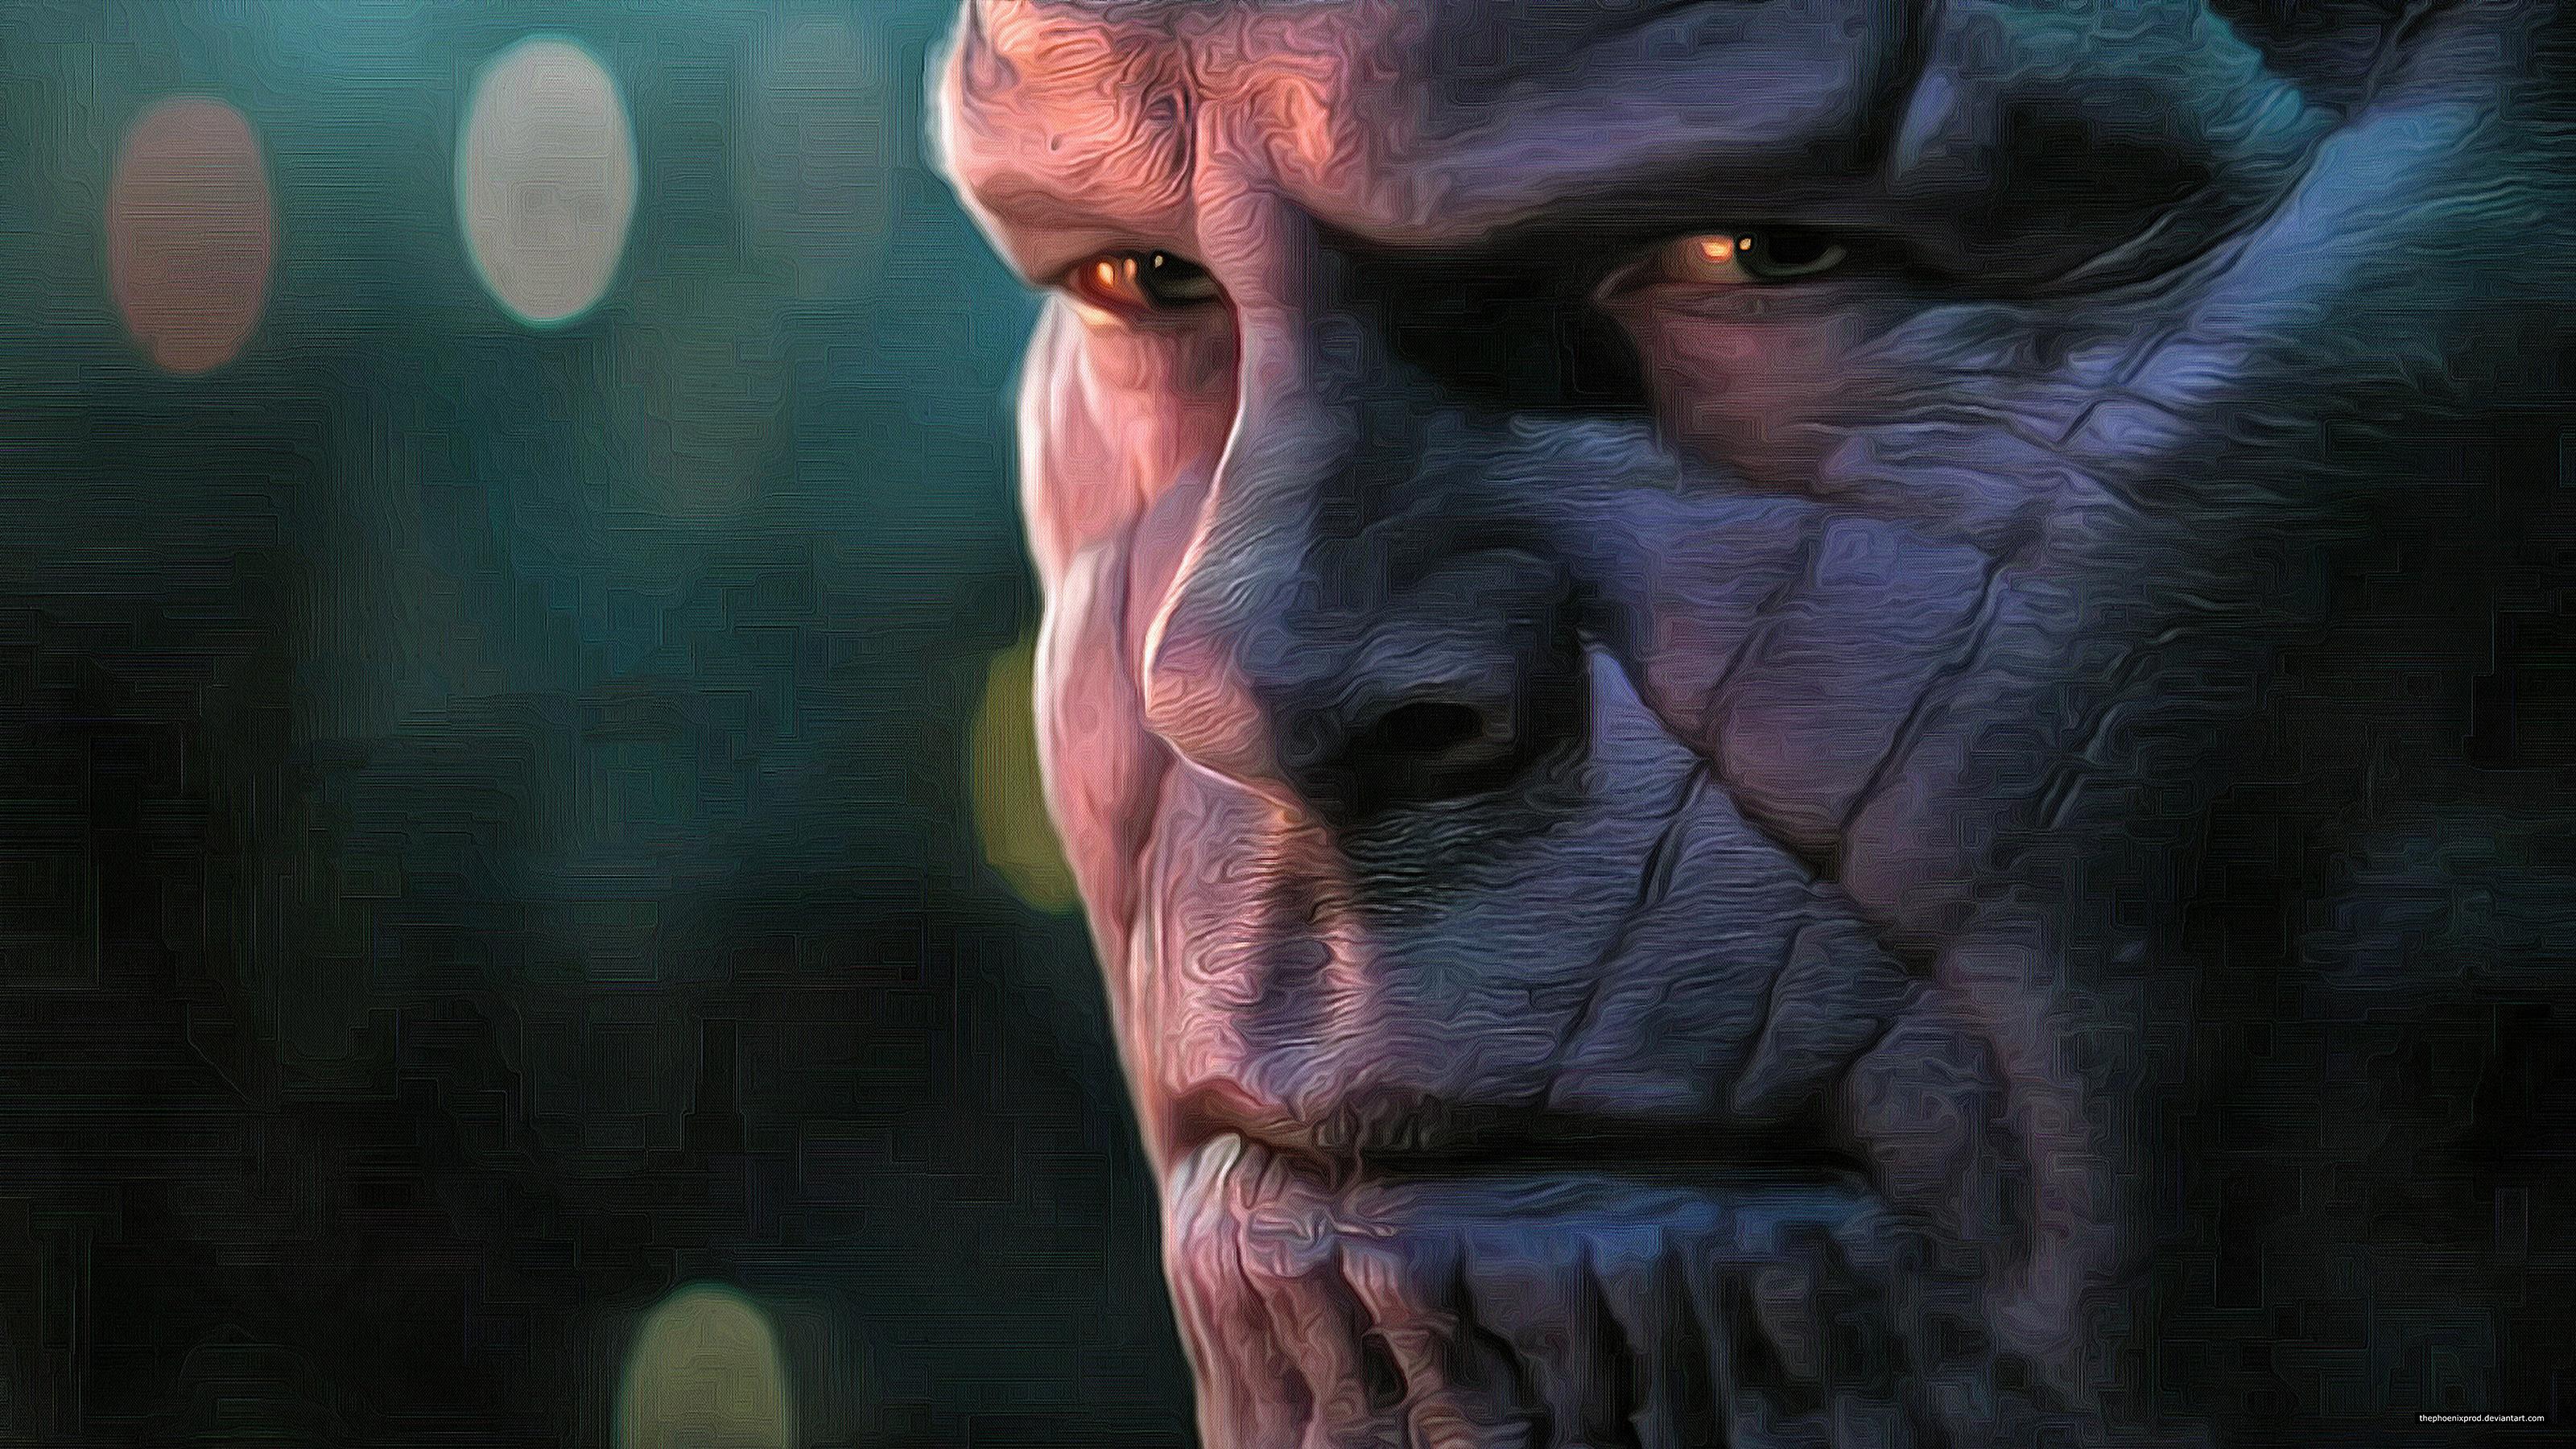 Thanos In Avengers Infinity War 2018 4k Artwork, HD Movies ...